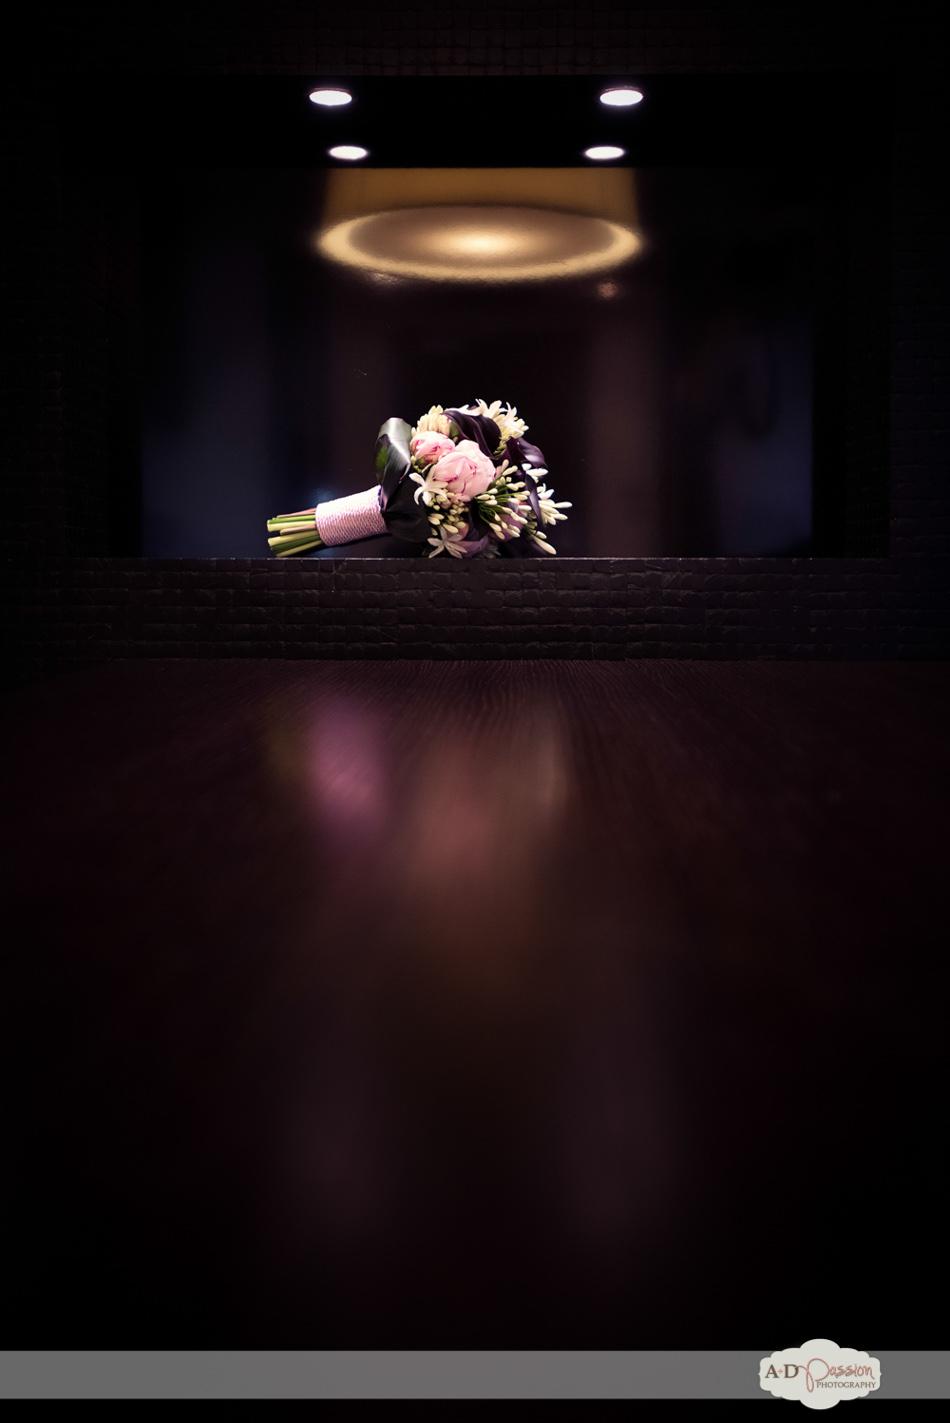 AD Passion Photography | fotograf-nunta-vintage_ad-passion_anda-marius_nunta-in-pitesti_0011 | Adelin, Dida, fotograf profesionist, fotograf de nunta, fotografie de nunta, fotograf Timisoara, fotograf Craiova, fotograf Bucuresti, fotograf Arad, nunta Timisoara, nunta Arad, nunta Bucuresti, nunta Craiova